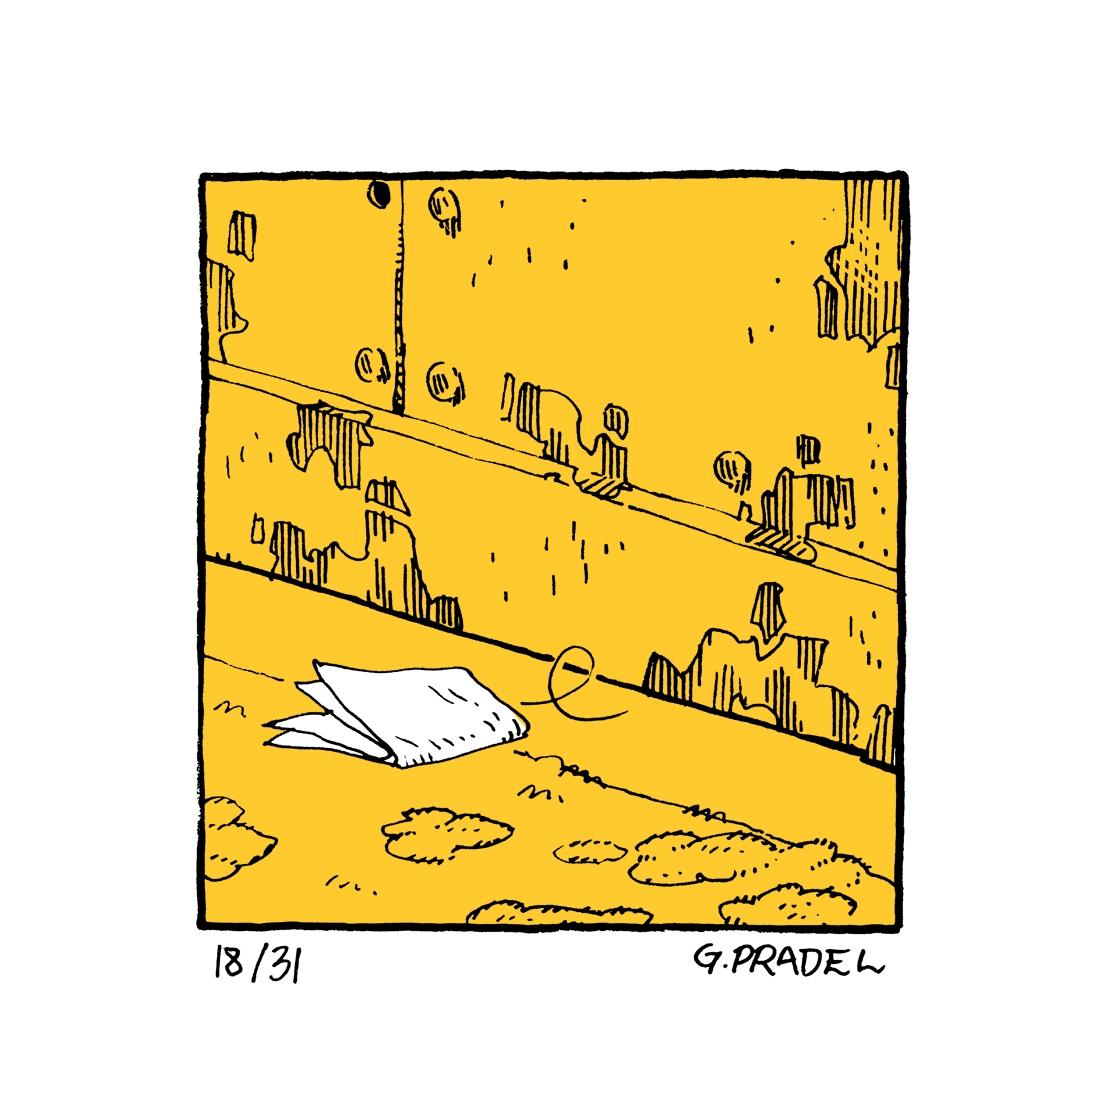 Inktober 18 2018